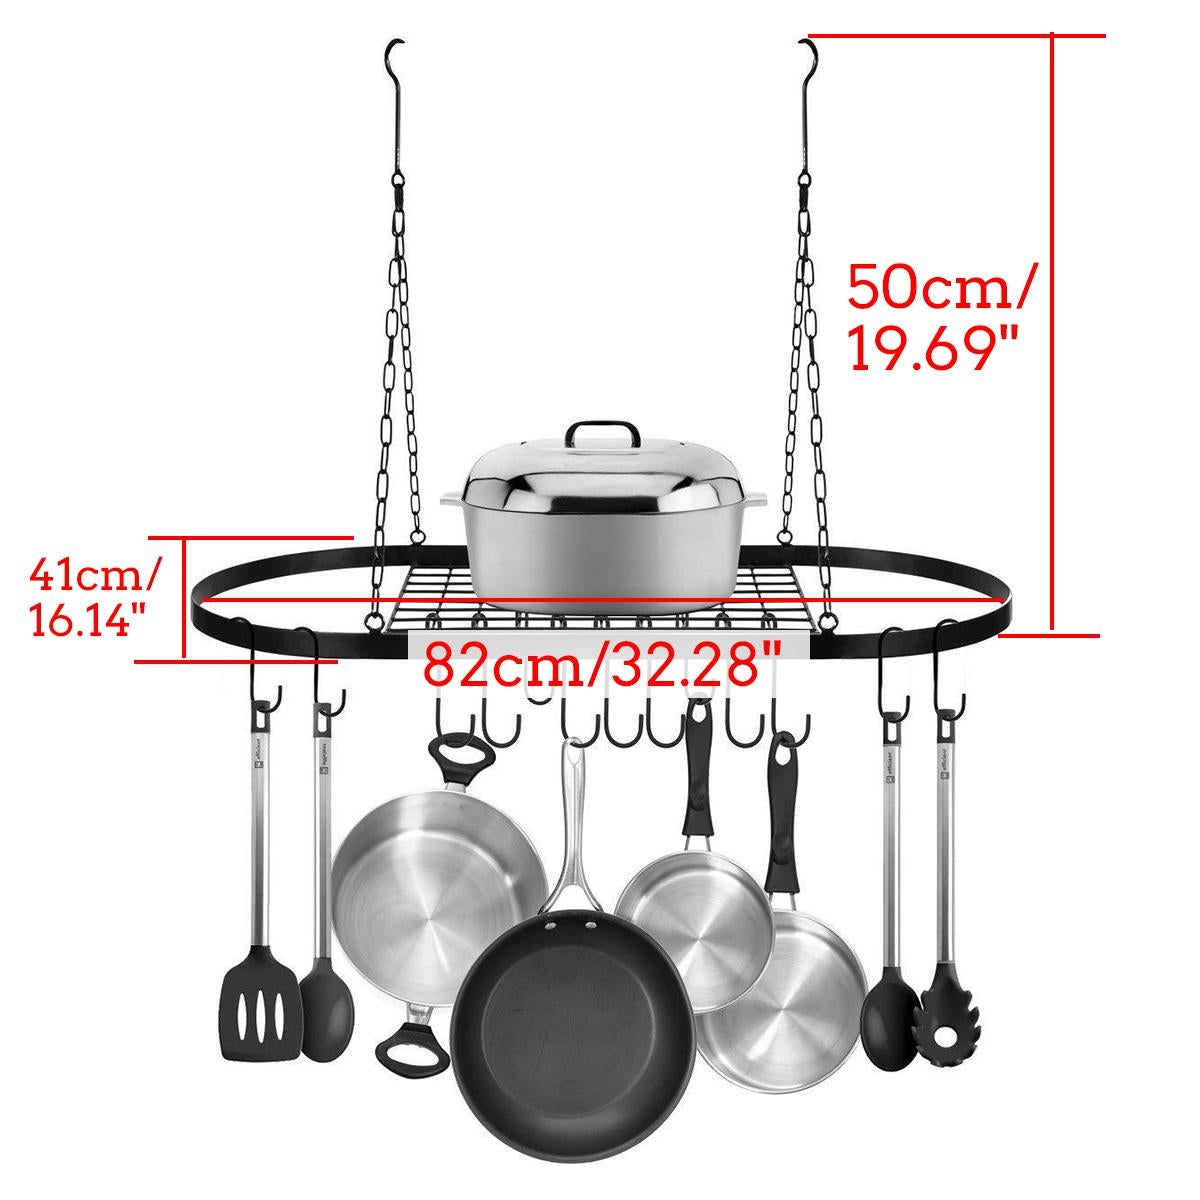 iron hanging pot saucepan pan hanger storage rack 10 hooks large cookware